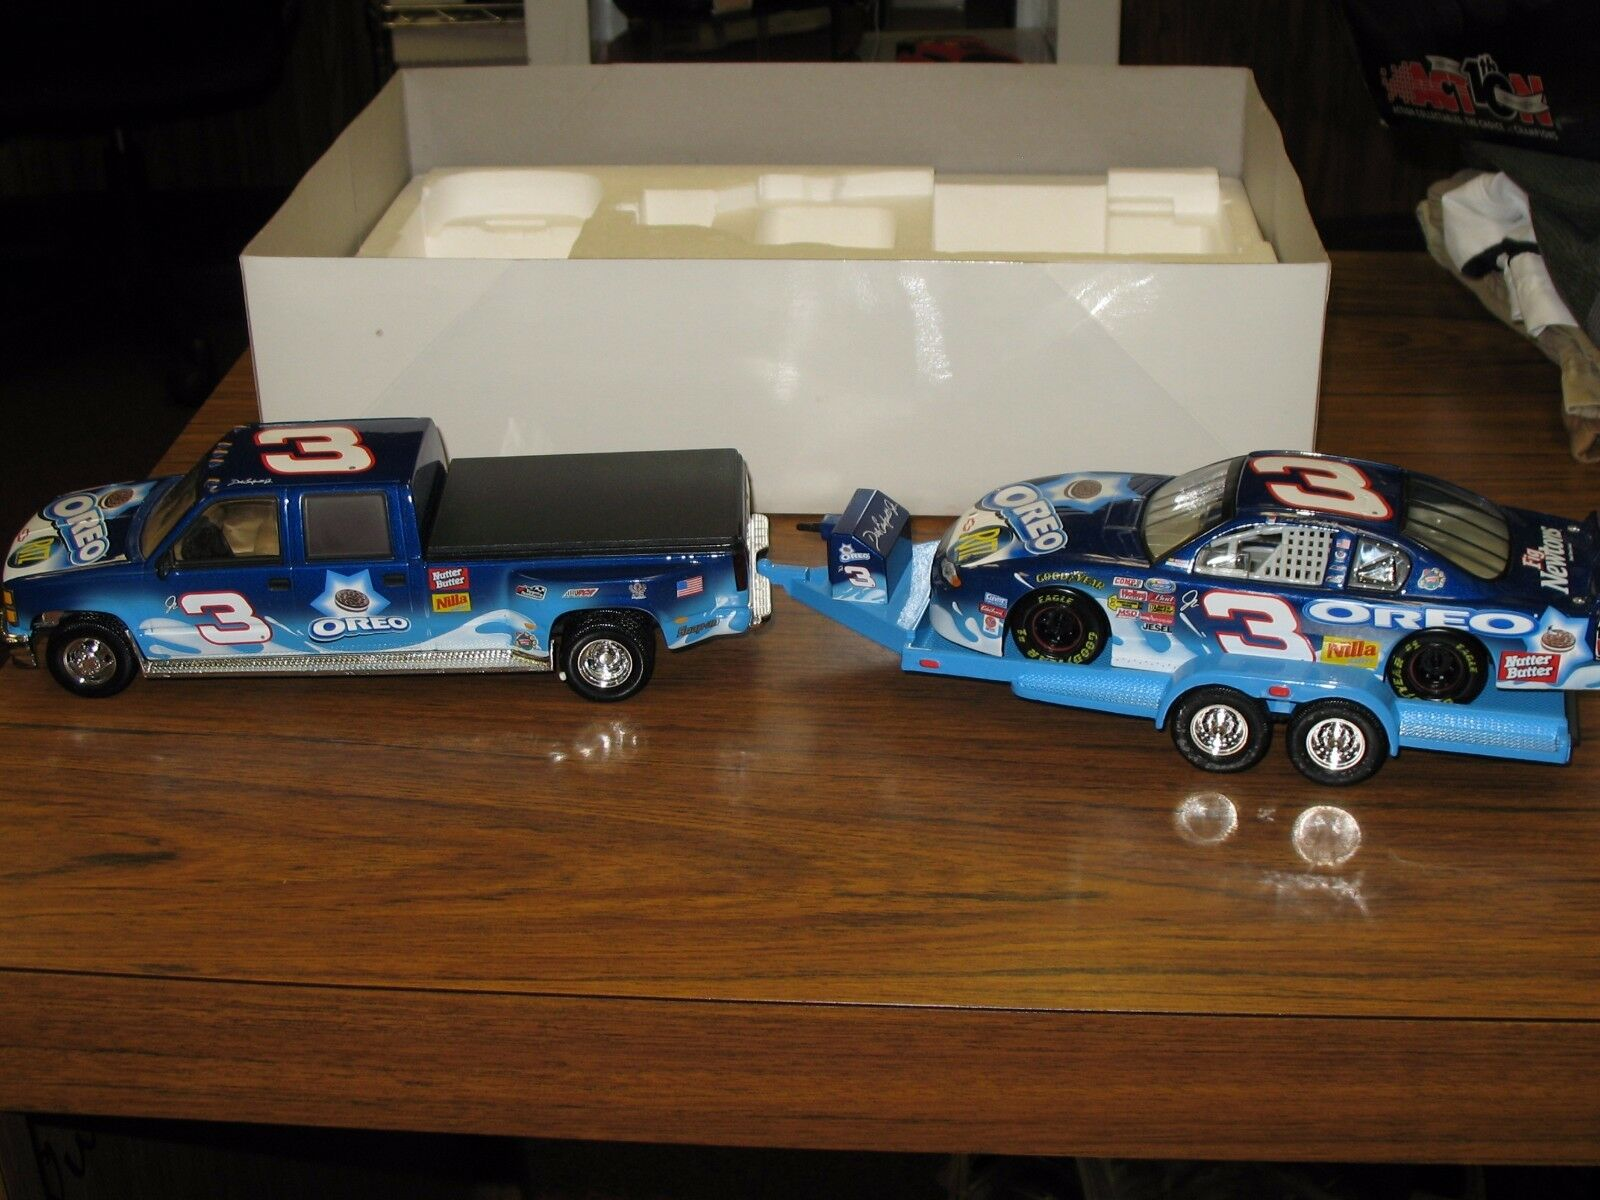 Dale Earnhardt Jr Brookfield Collectors Guild 1 24 2002 Oreo Oreo Oreo Car Cab & Trailer 2724b0